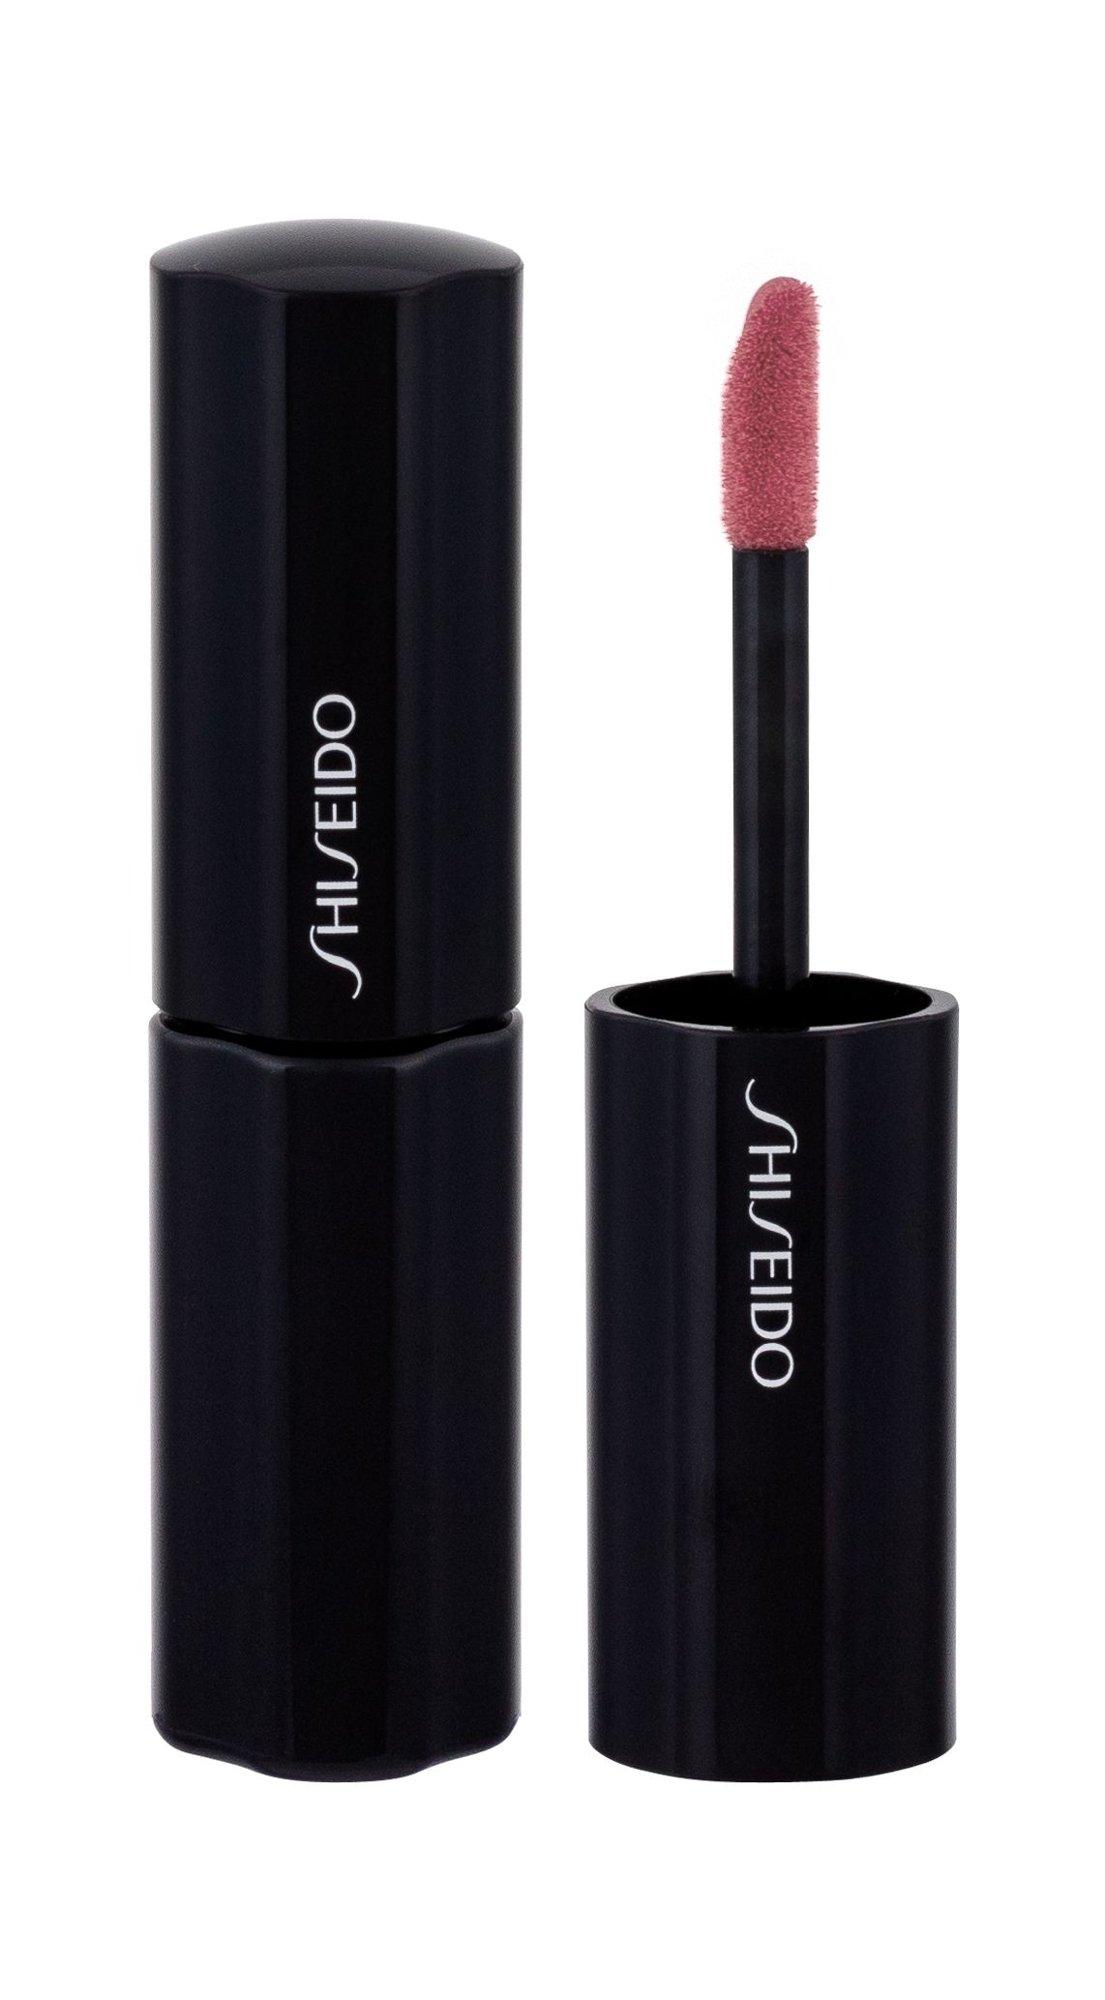 Shiseido Lacquer Rouge Lipstick 6ml PK226